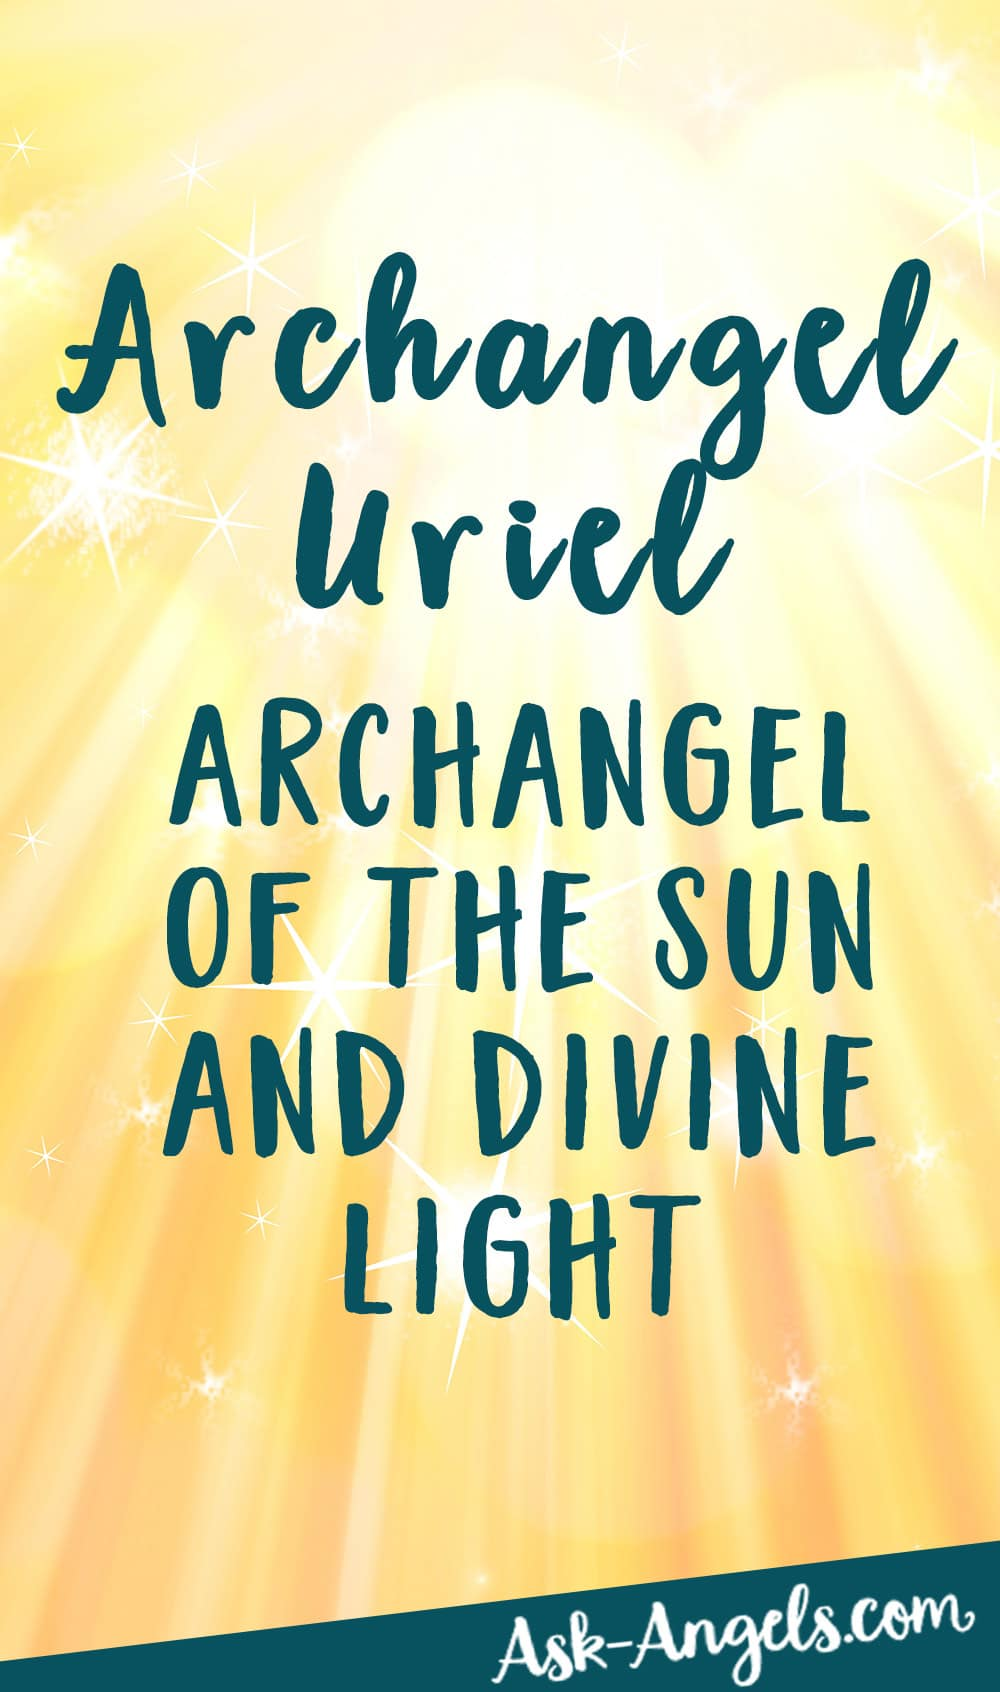 Archangel Uriel - Archangel of the Sun and Divine Light